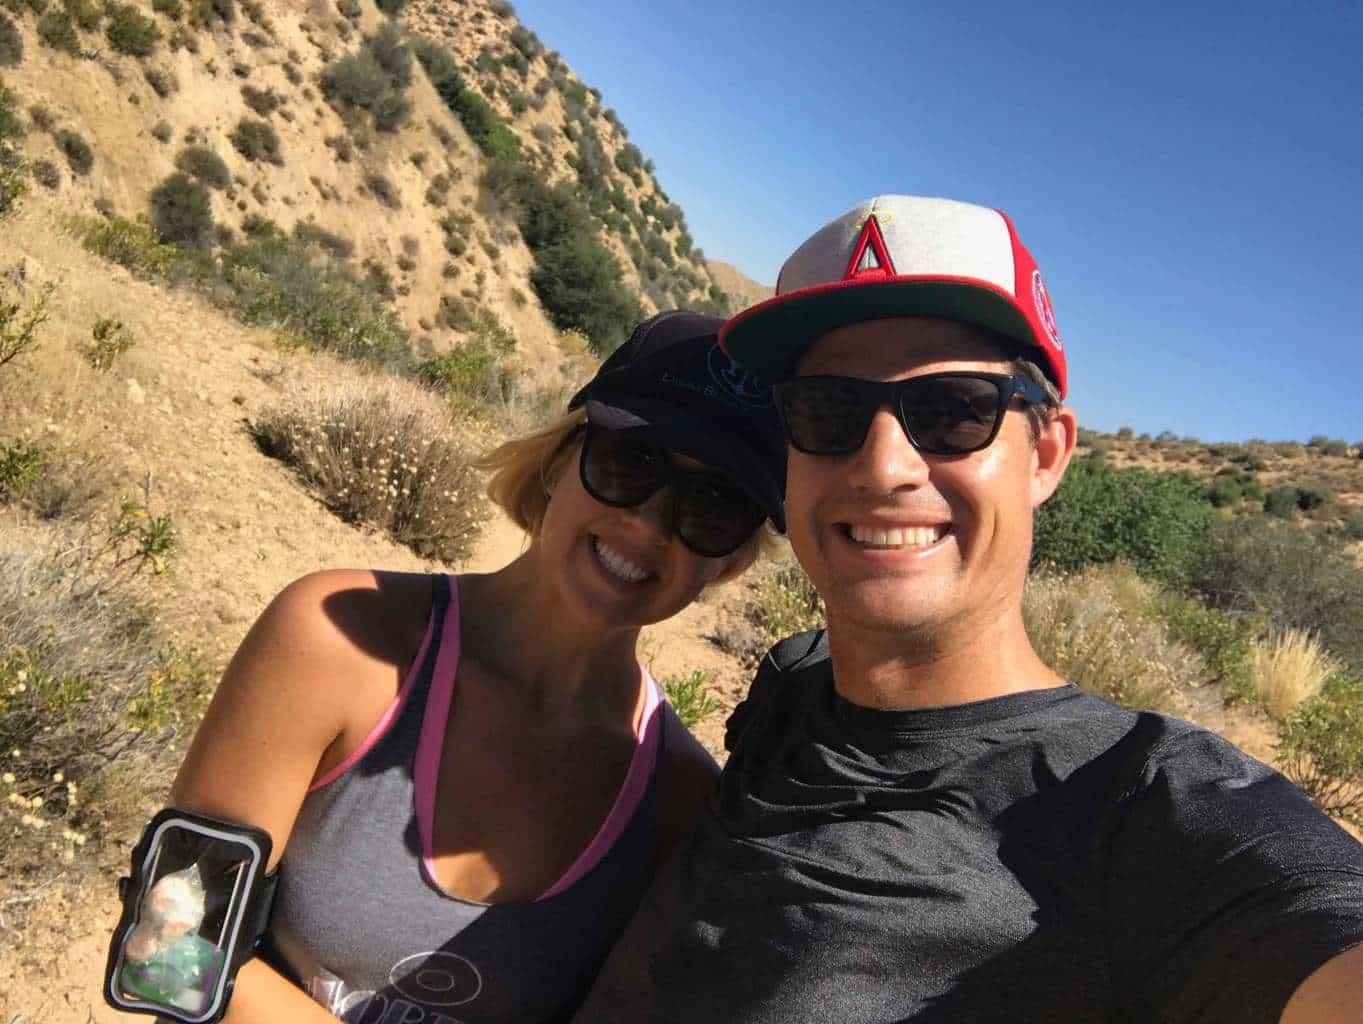 Deep-Creek-Hot-Springs-Lake-Arrowhead-Hiking-Trail-10